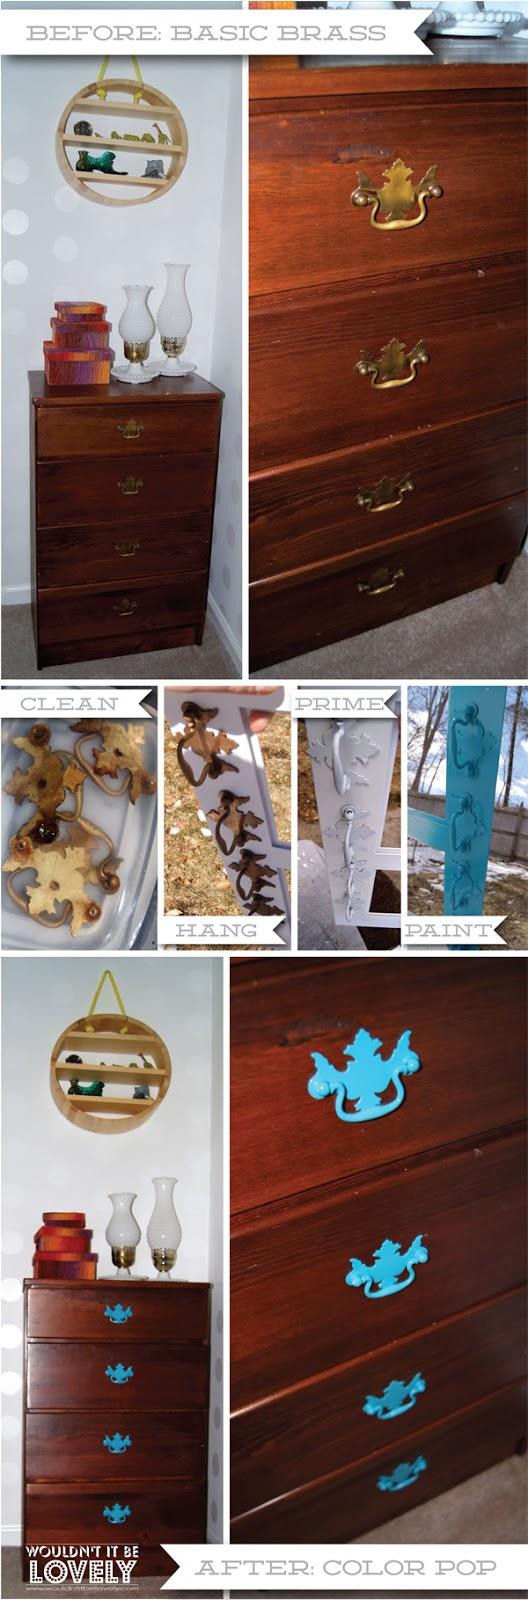 drawer+pull.jpg